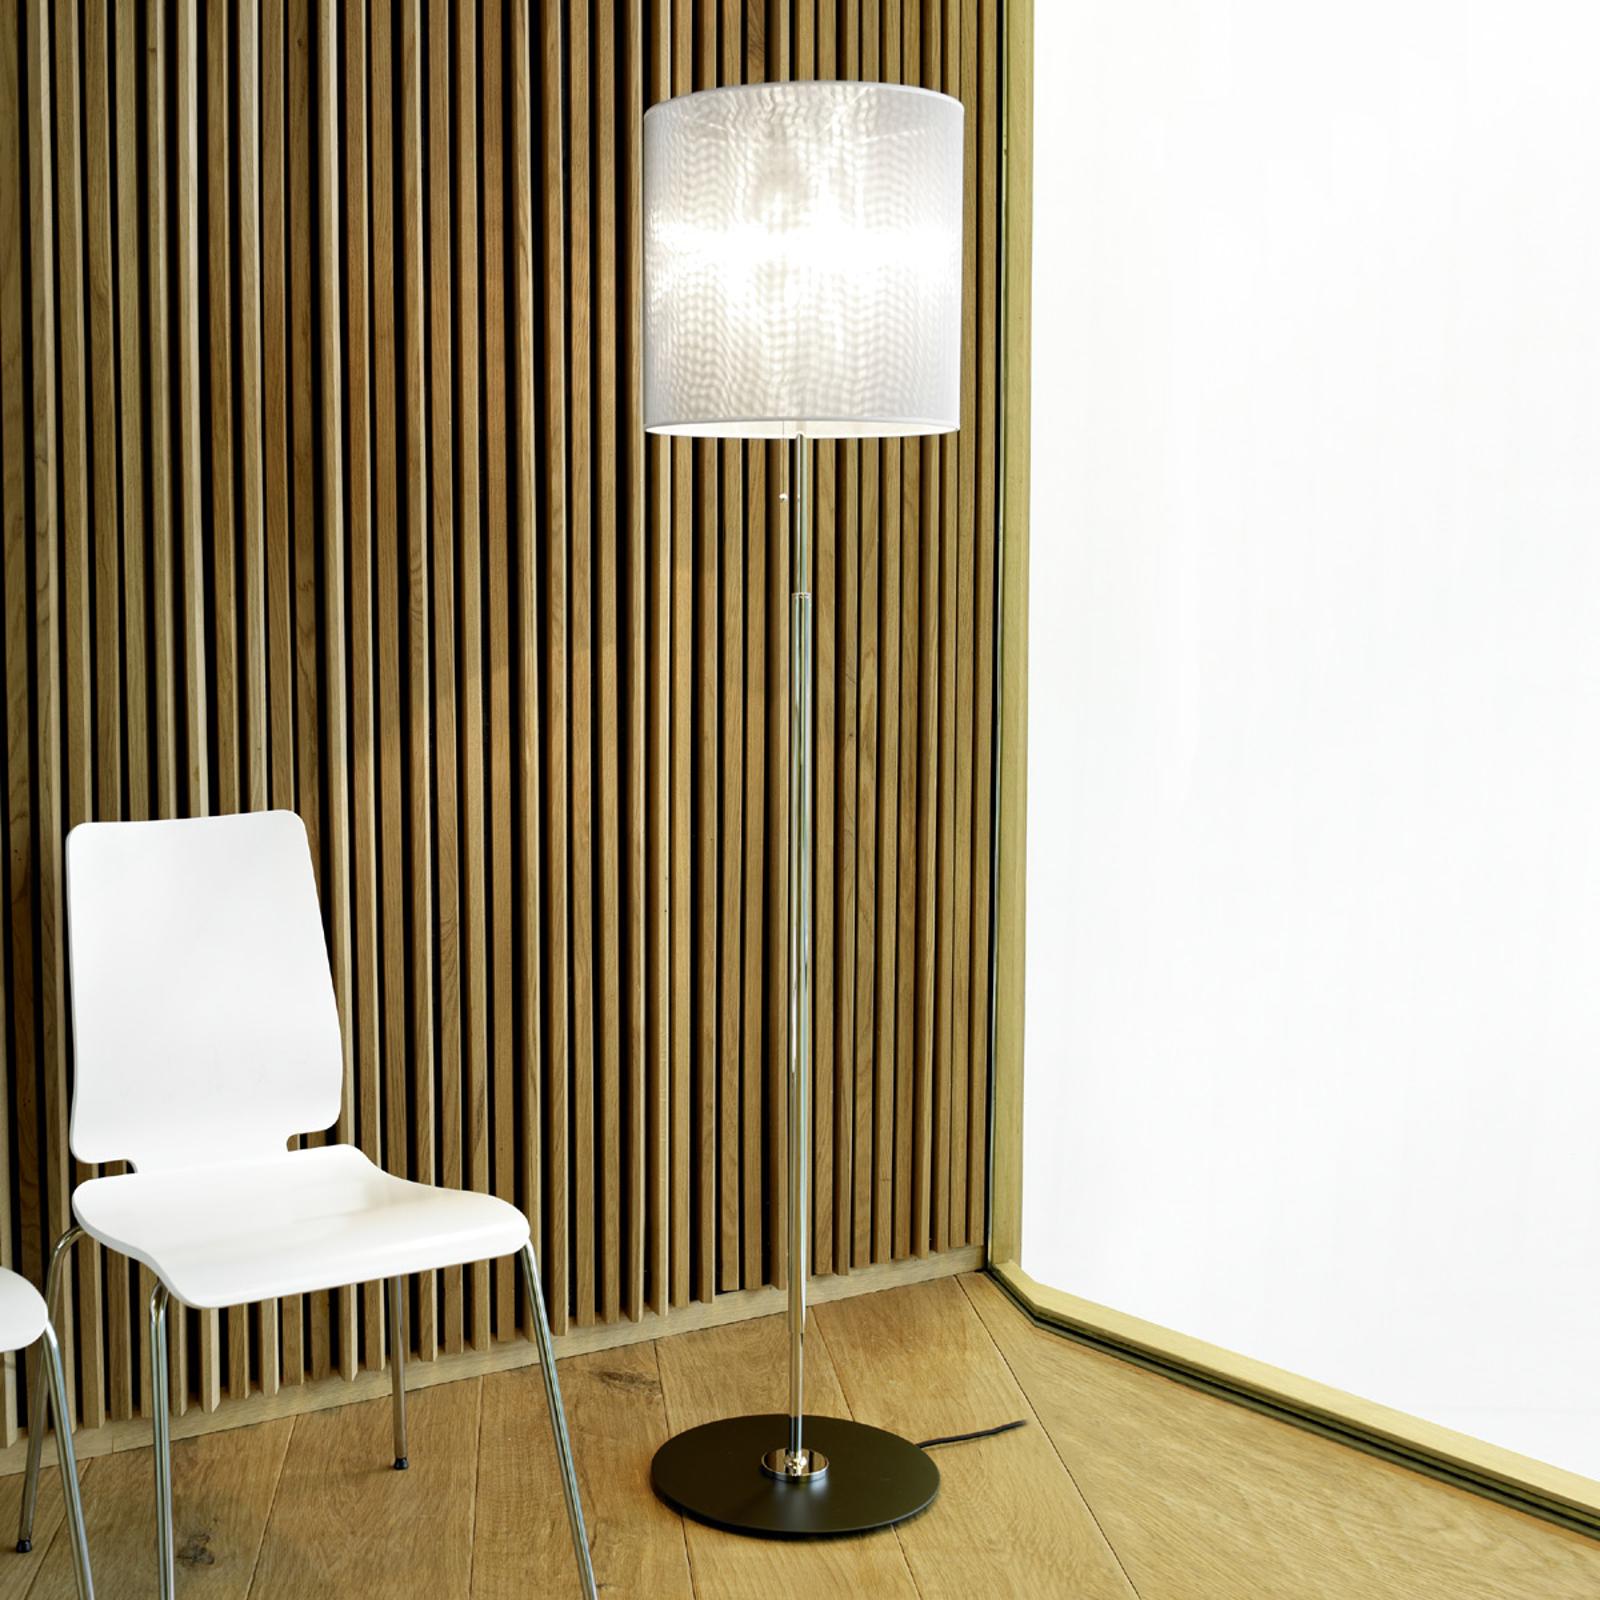 Markant design-vloerlamp, zeefgaas